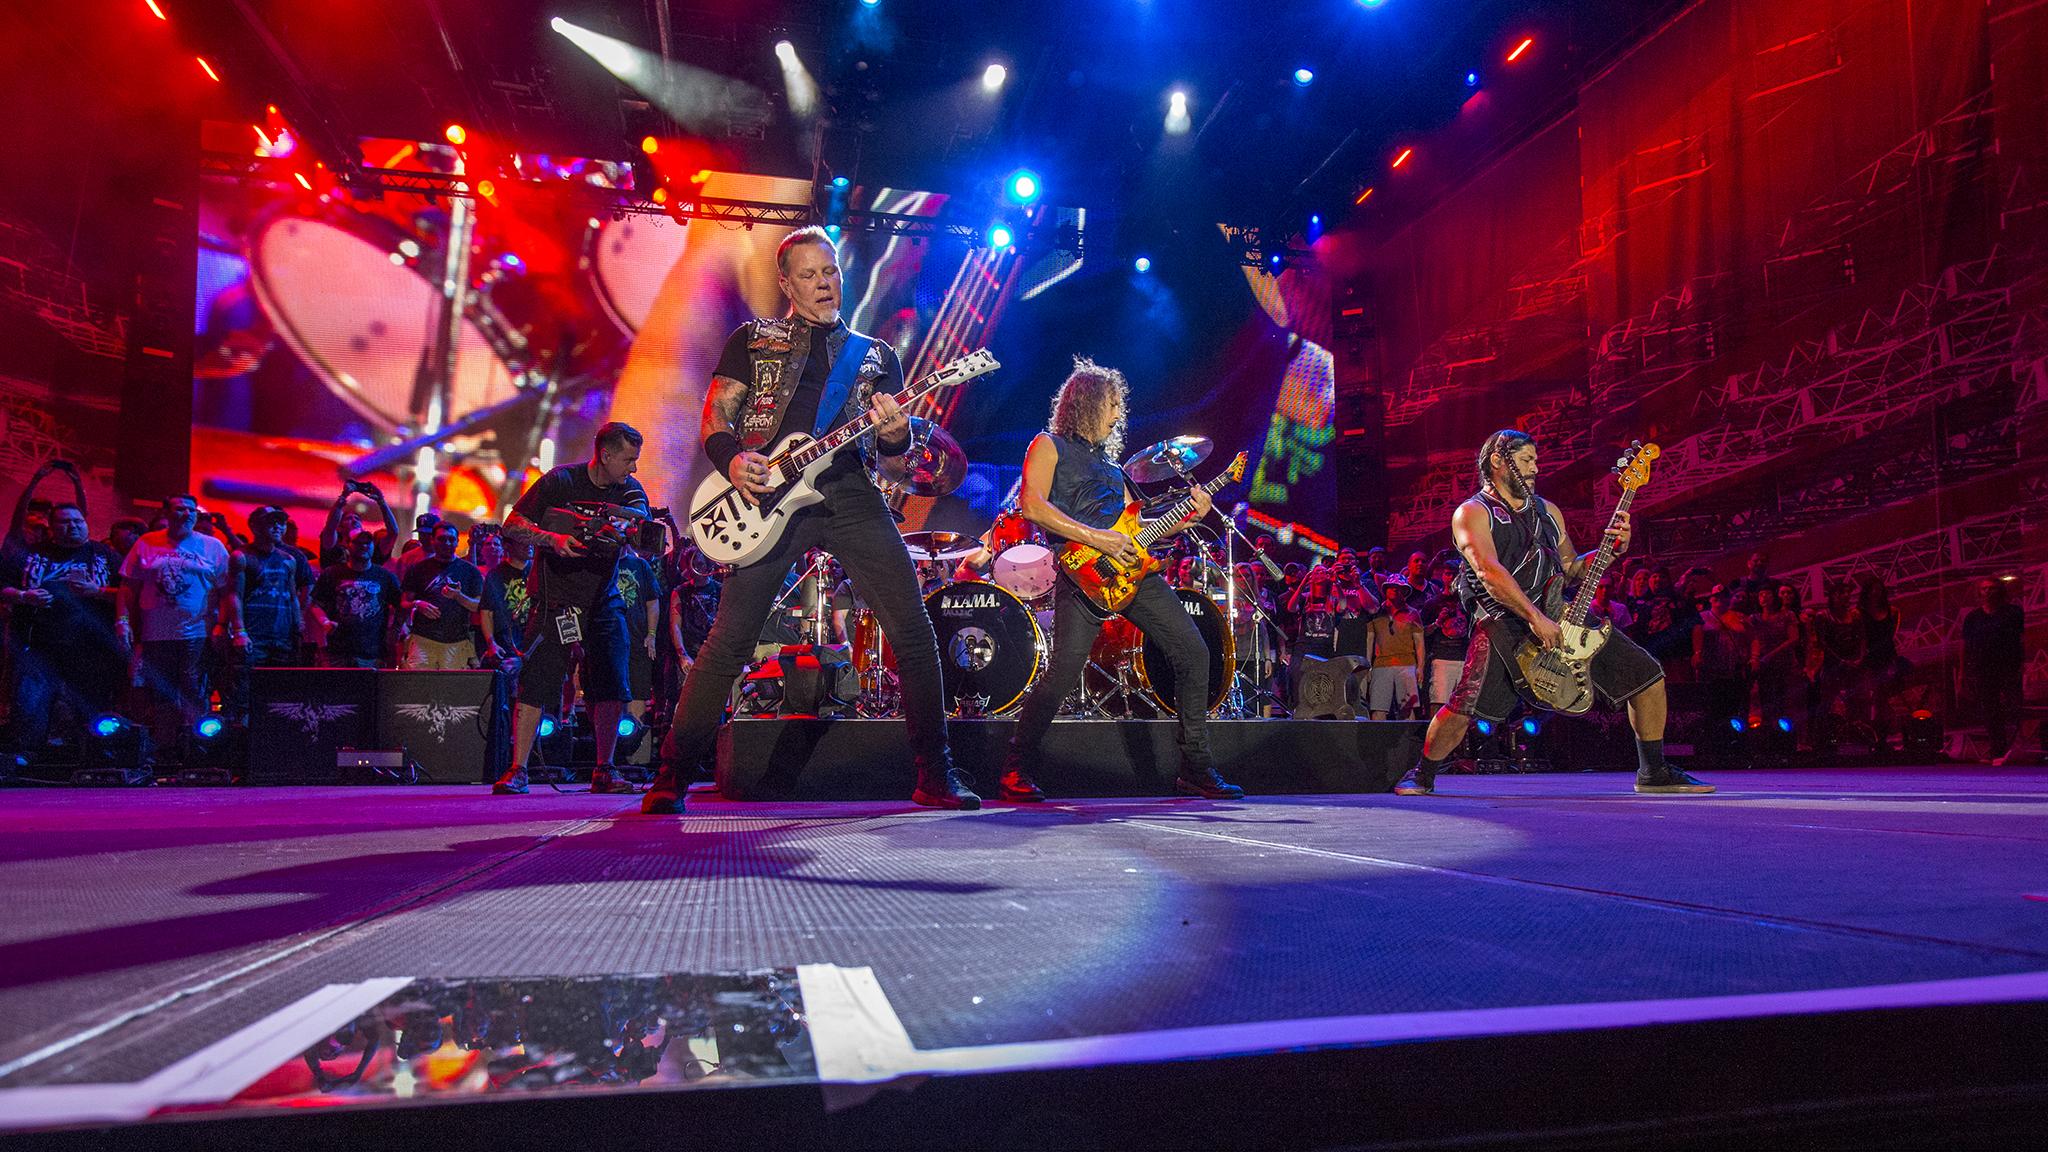 2: Metallica rocks Austin